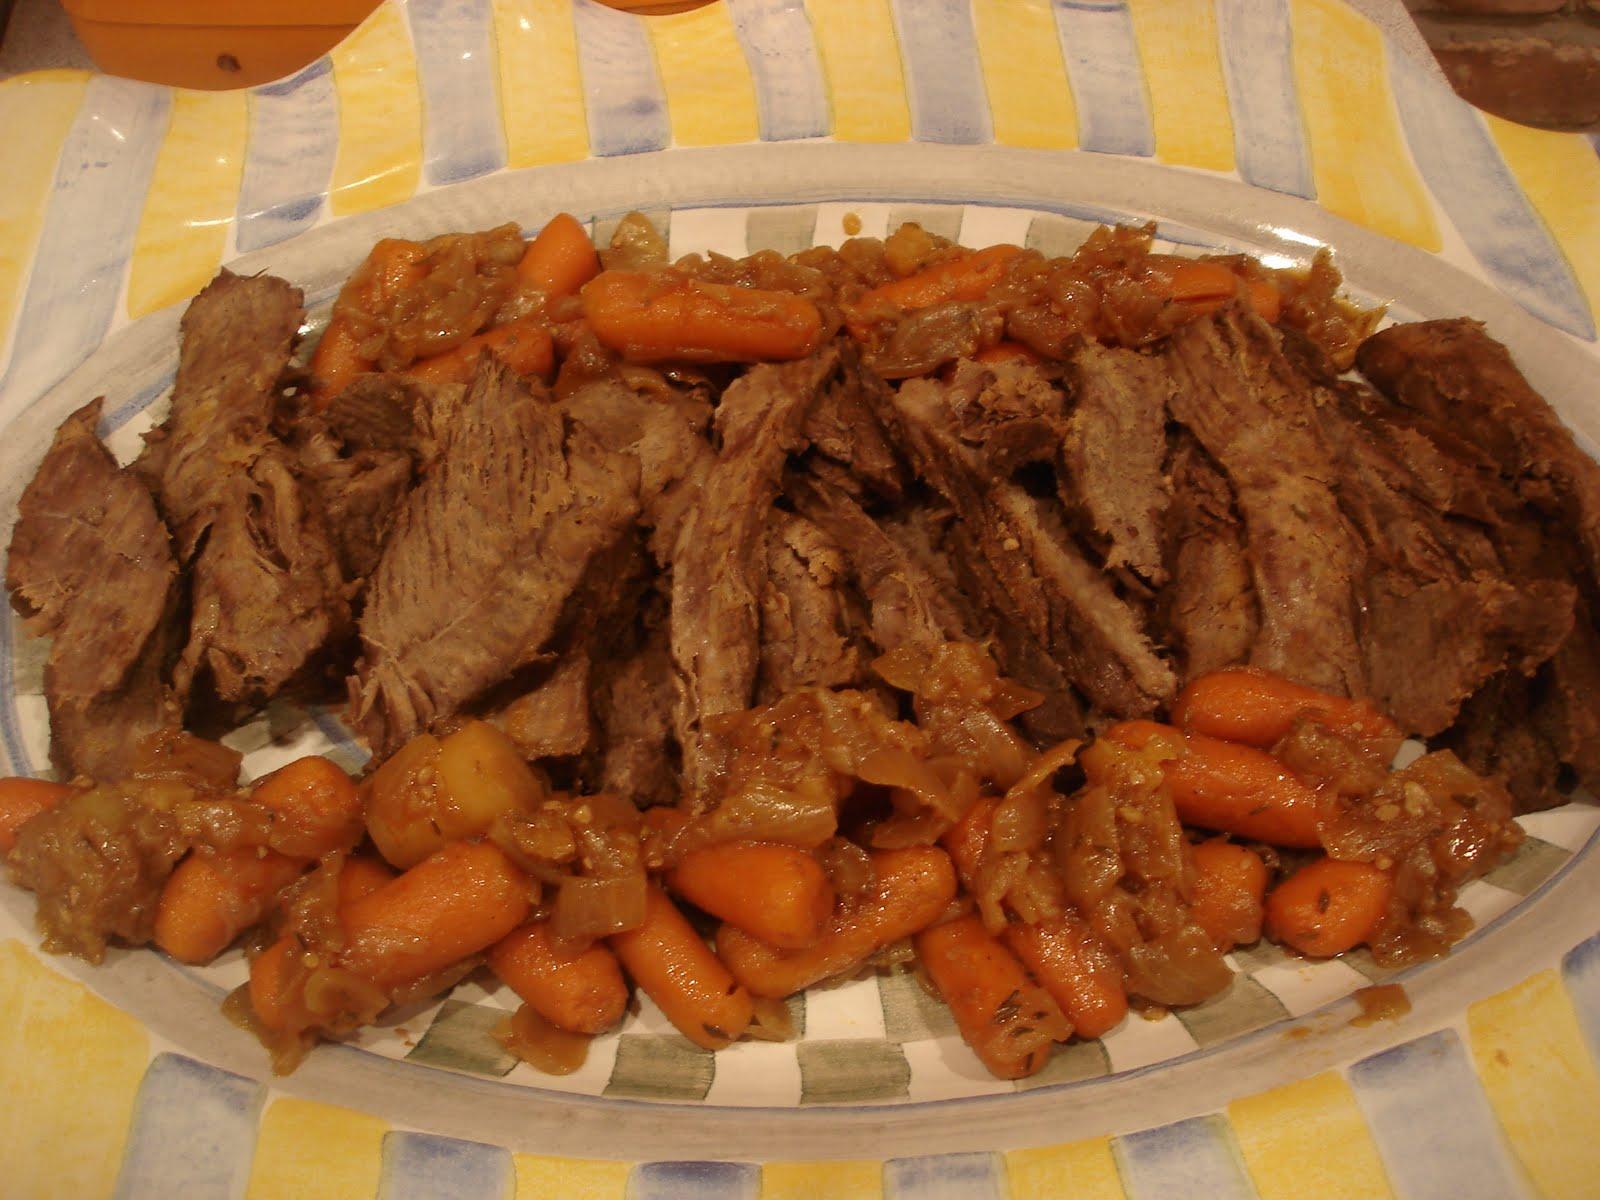 ... In Brooklyn: Sasha's Kitchen: Holiday Brisket for the Jewish New Year